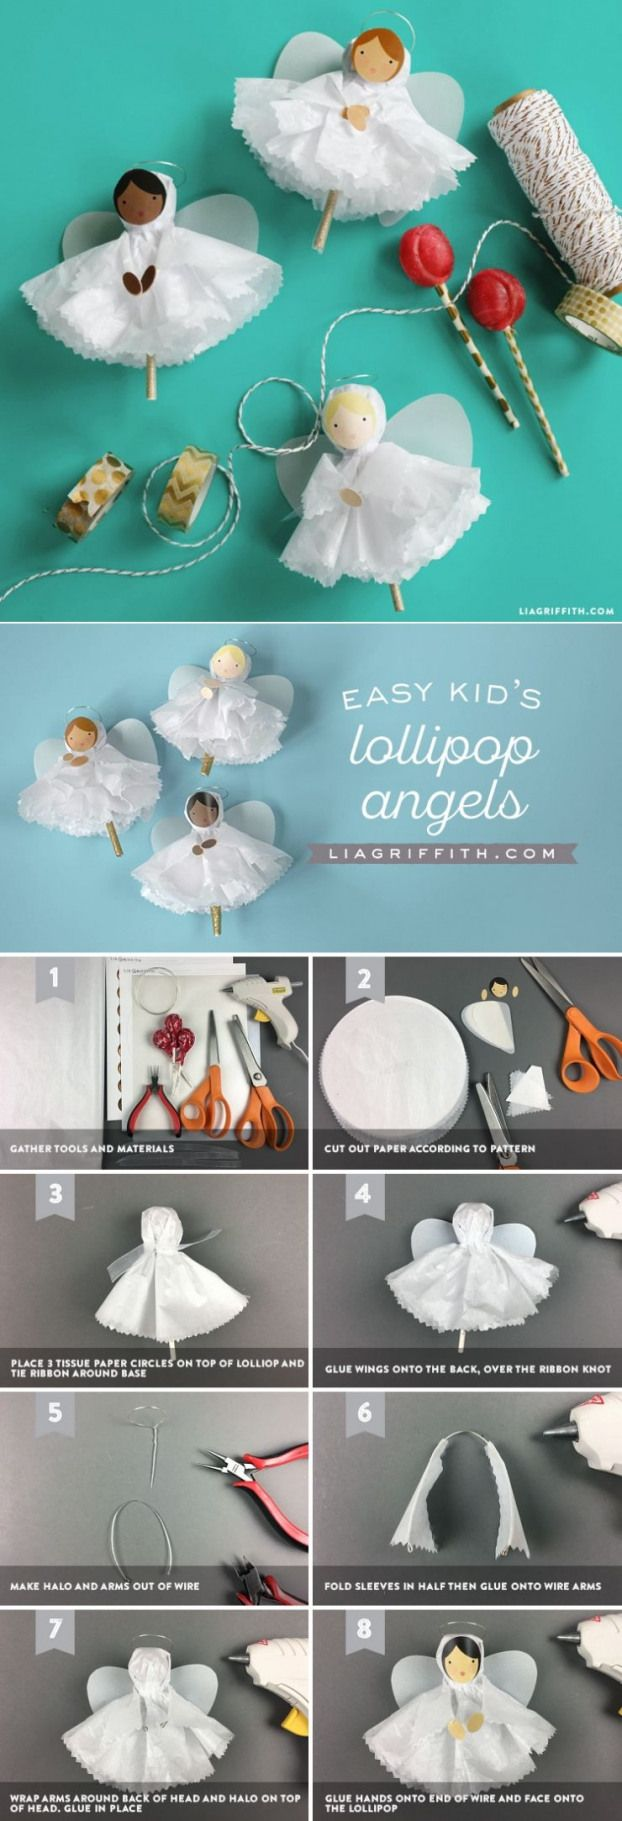 Tissue Paper Angels DIY Kid's Holiday Craft